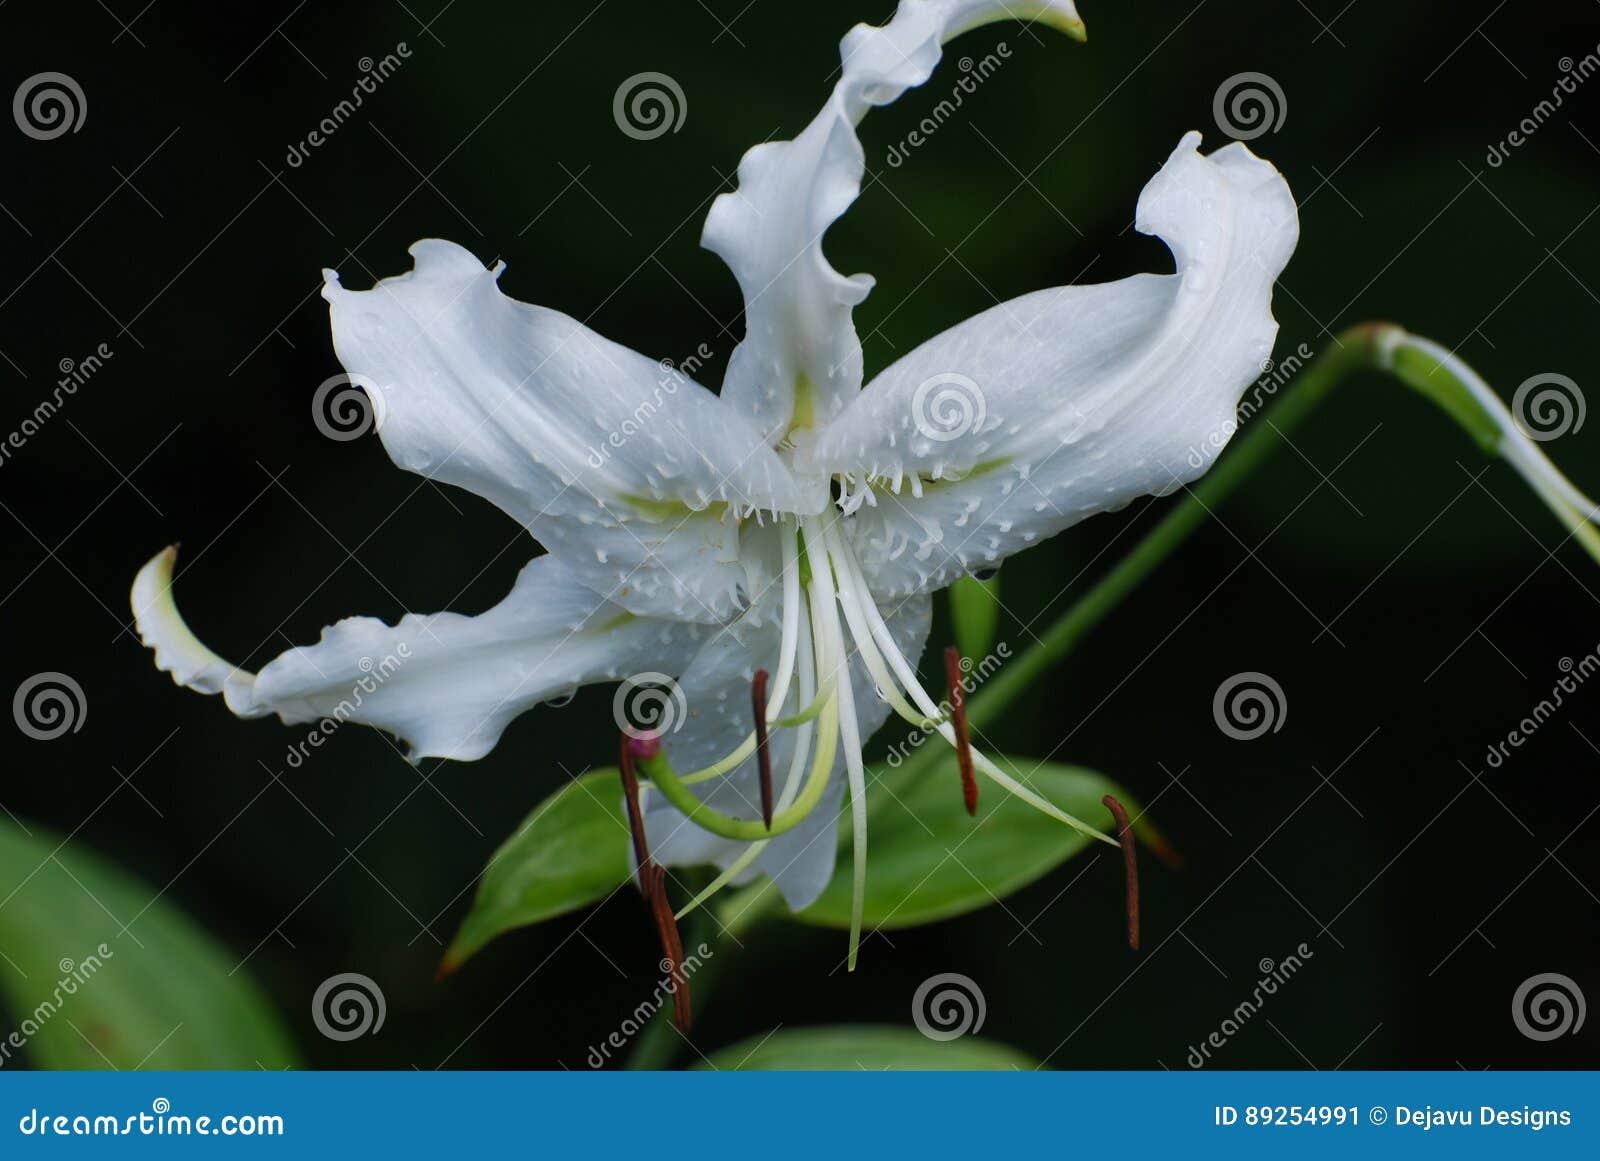 Pretty White Stargazer Lily Flower Blossom Stock Image Image Of